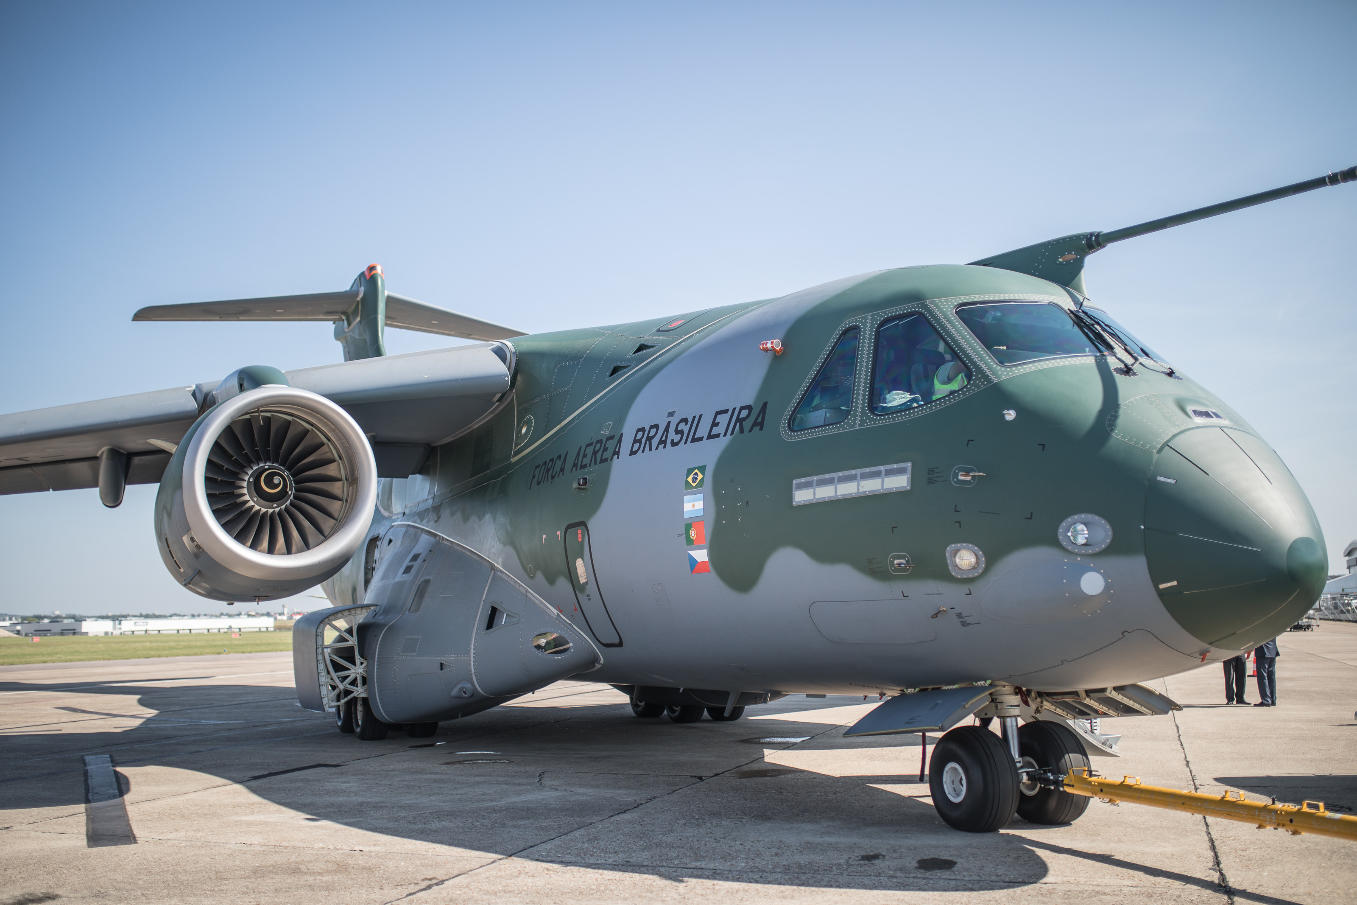 KC-390 flight testing moves to U.S.